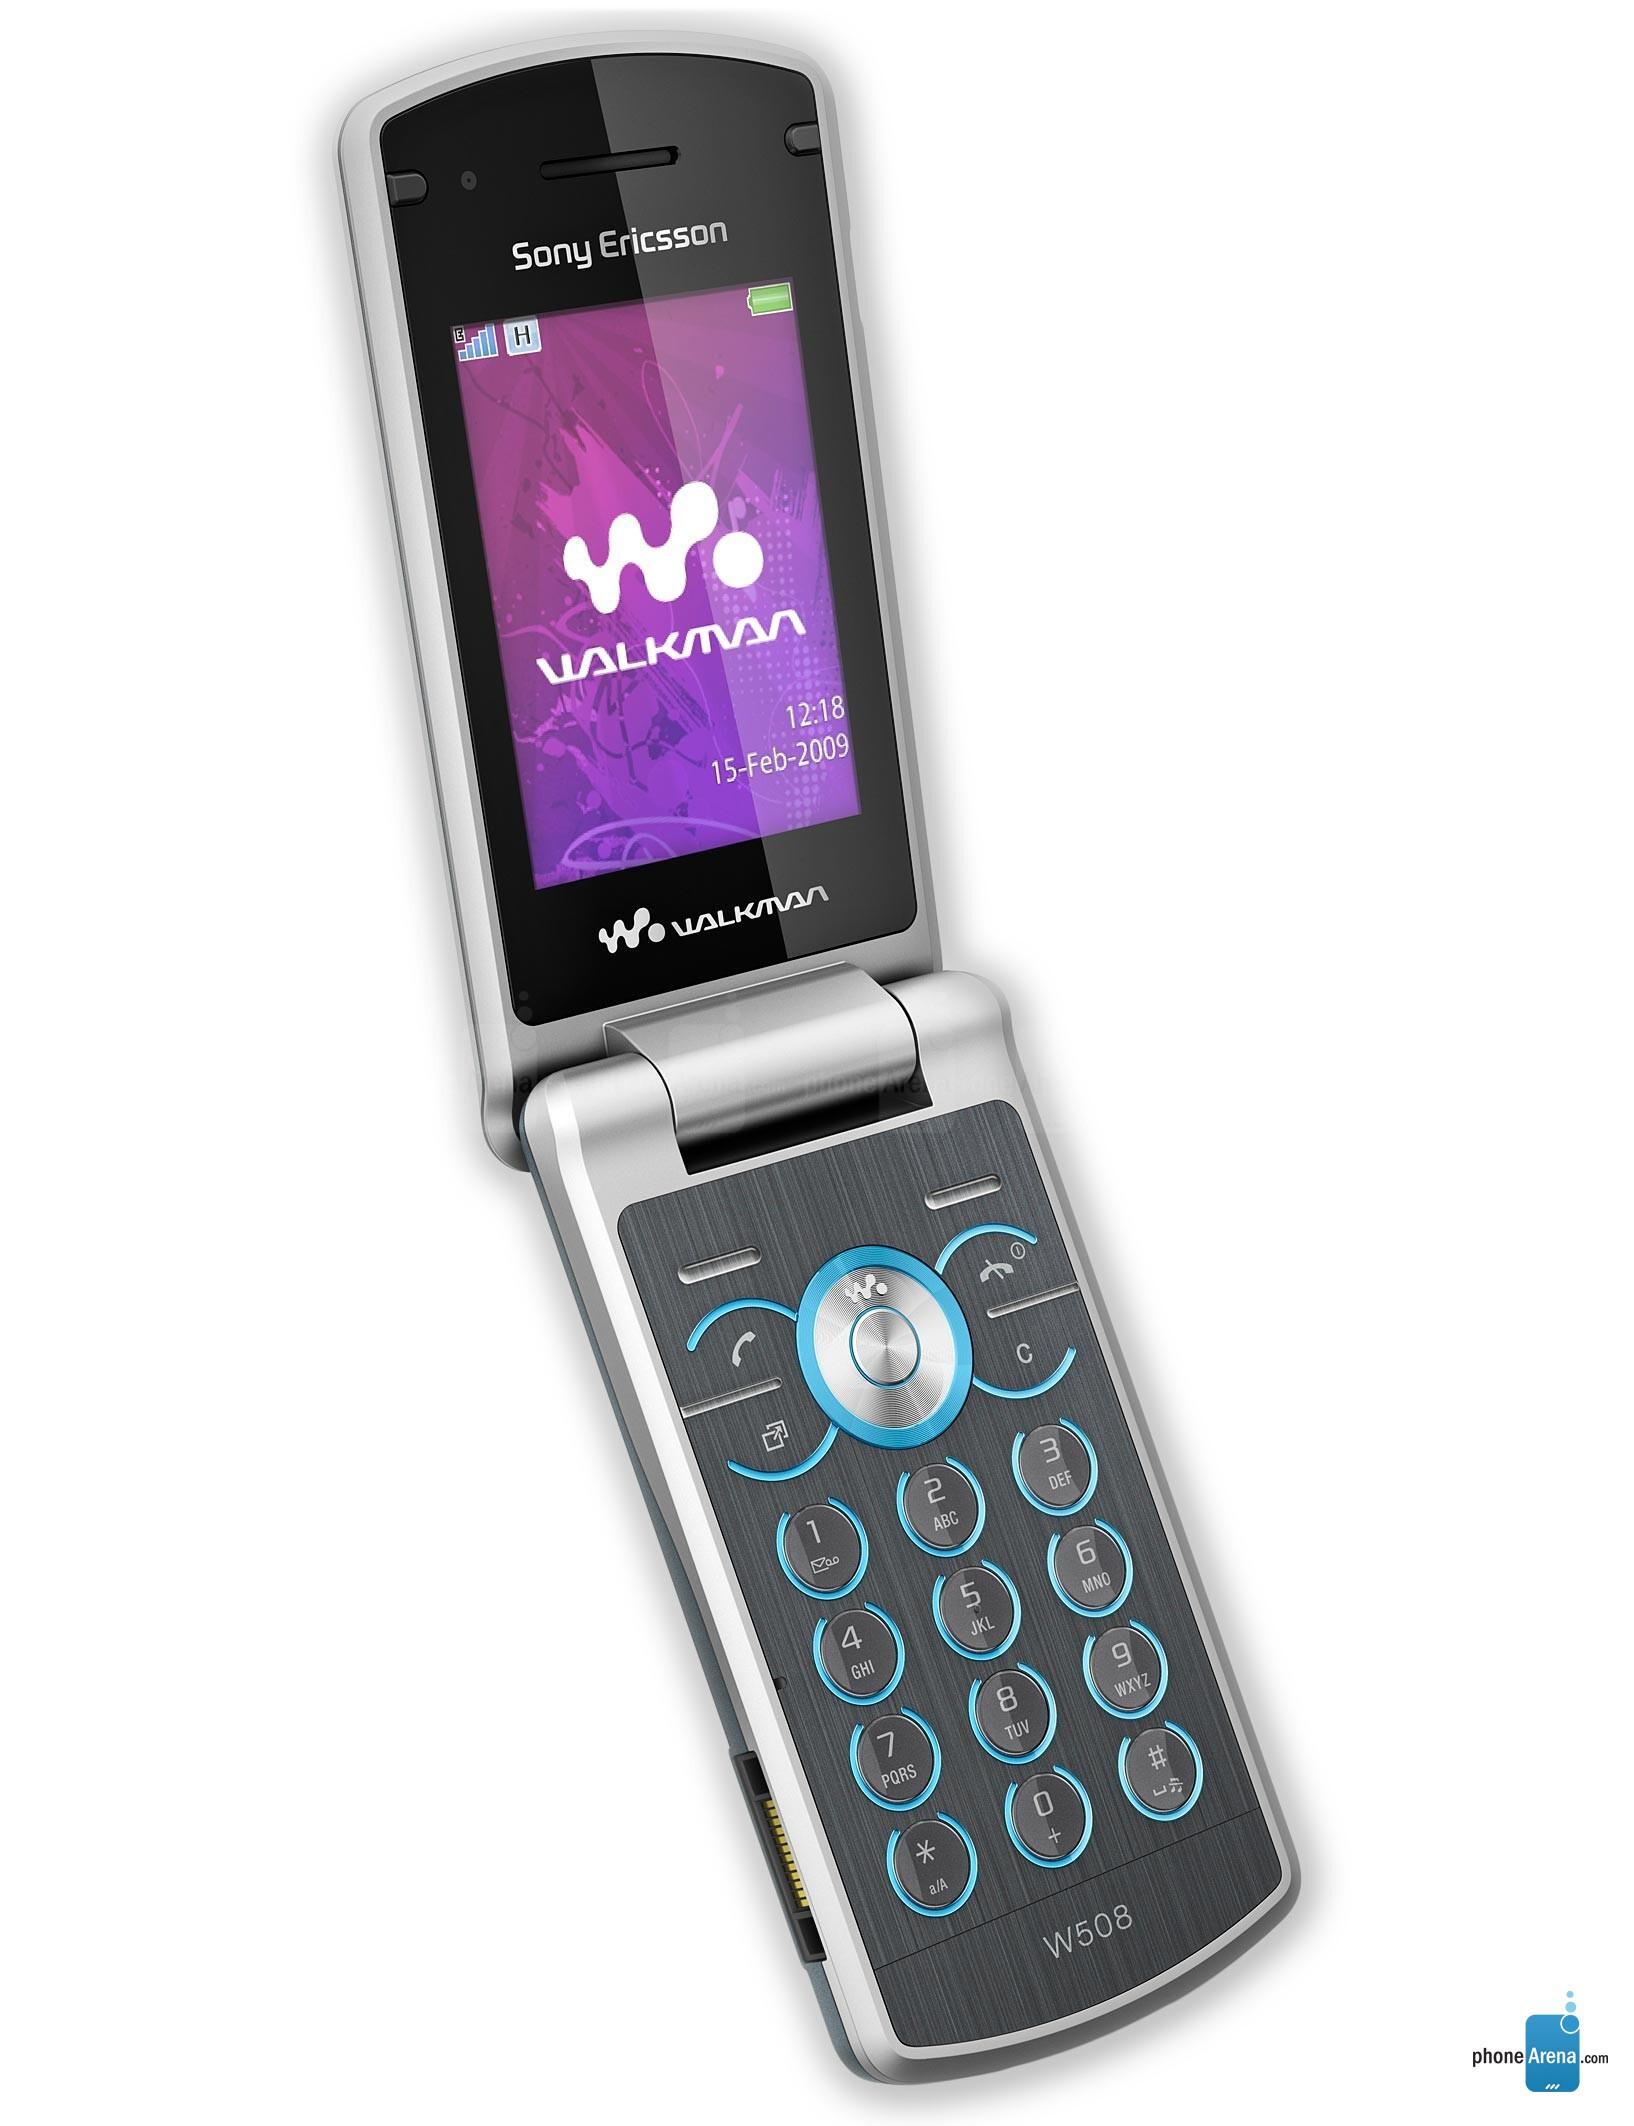 sony ericsson w508 photos rh phonearena com Sony Ericsson W510 Sony Ericsson W980